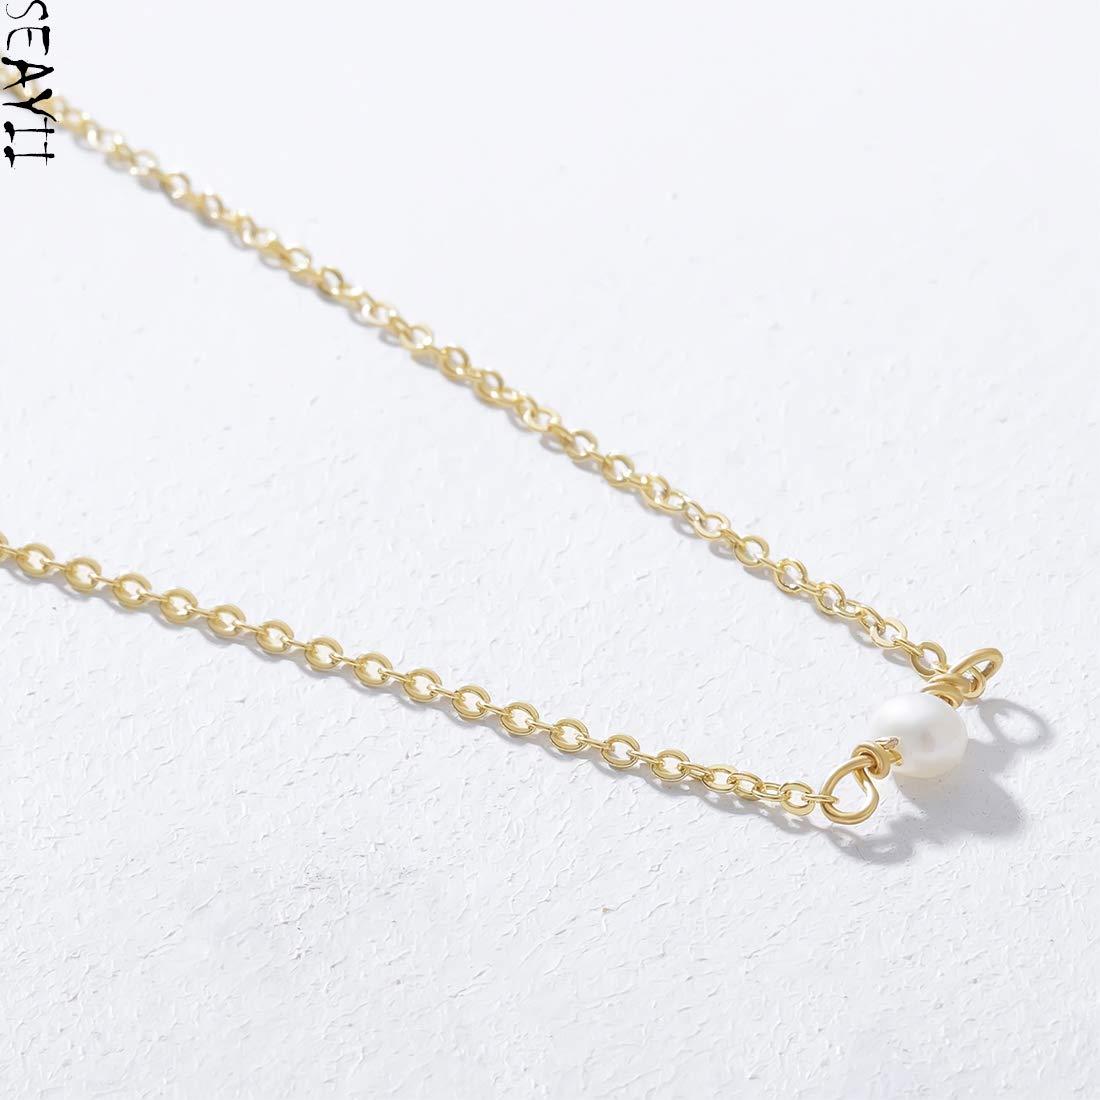 Gold Plated, Sold by Pair 14 GA Golden Elegant Sparkle Filigree Dangle Nipple Shield Ring 316L Stainless Steel Body Piercing Jewelry For Men and Women Davana Enterprises